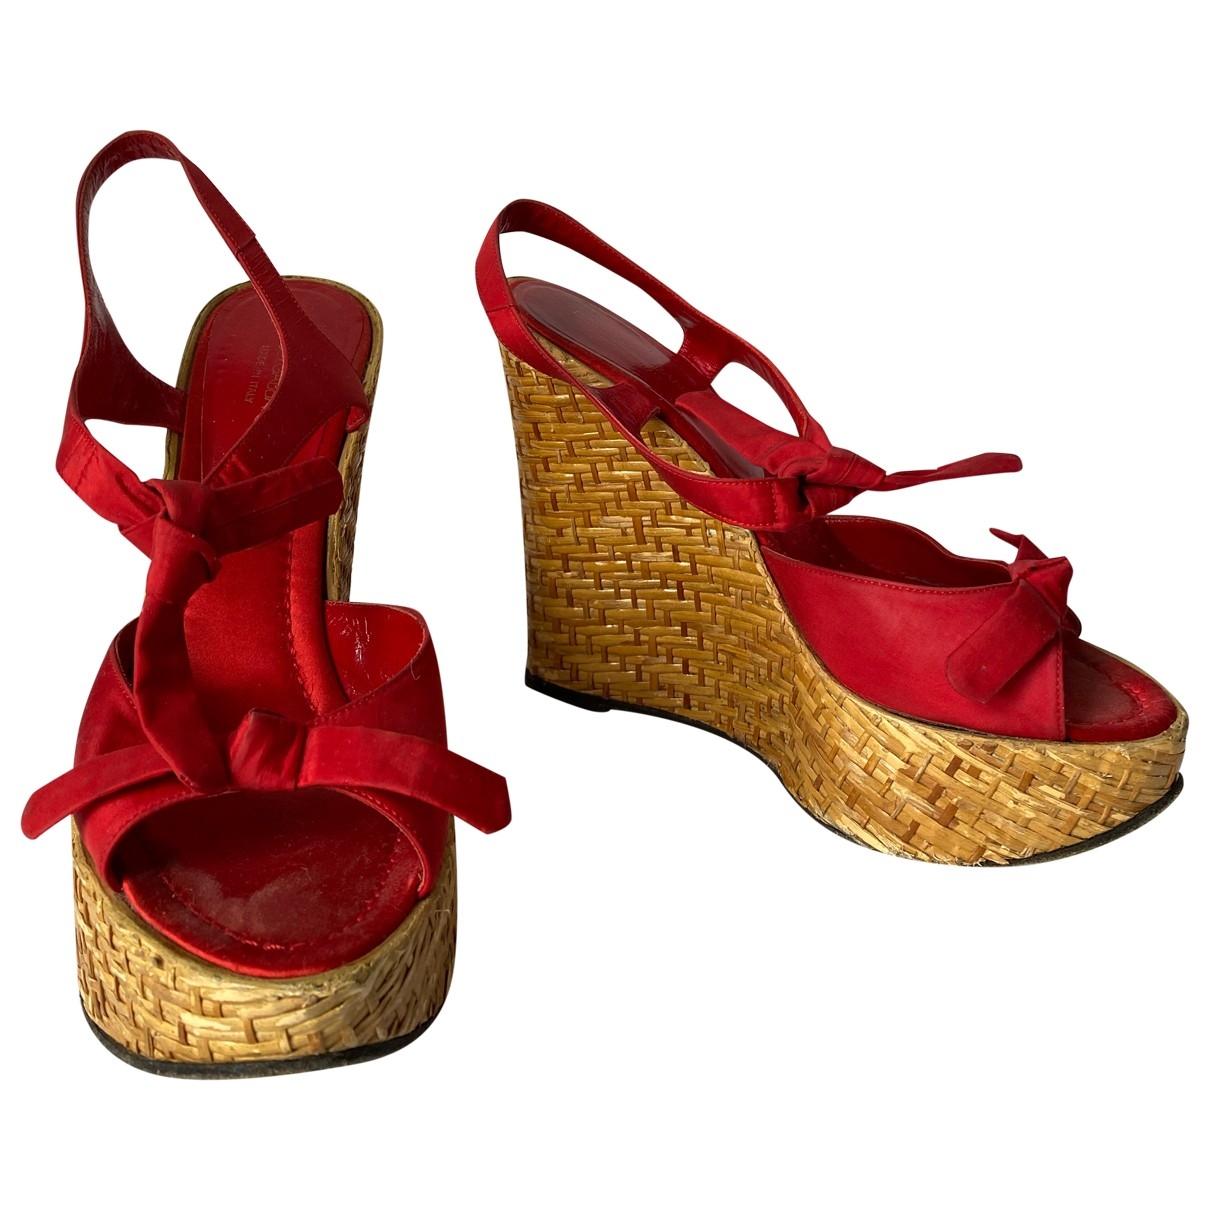 Dolce & Gabbana \N Espadrilles in  Rot Leinen